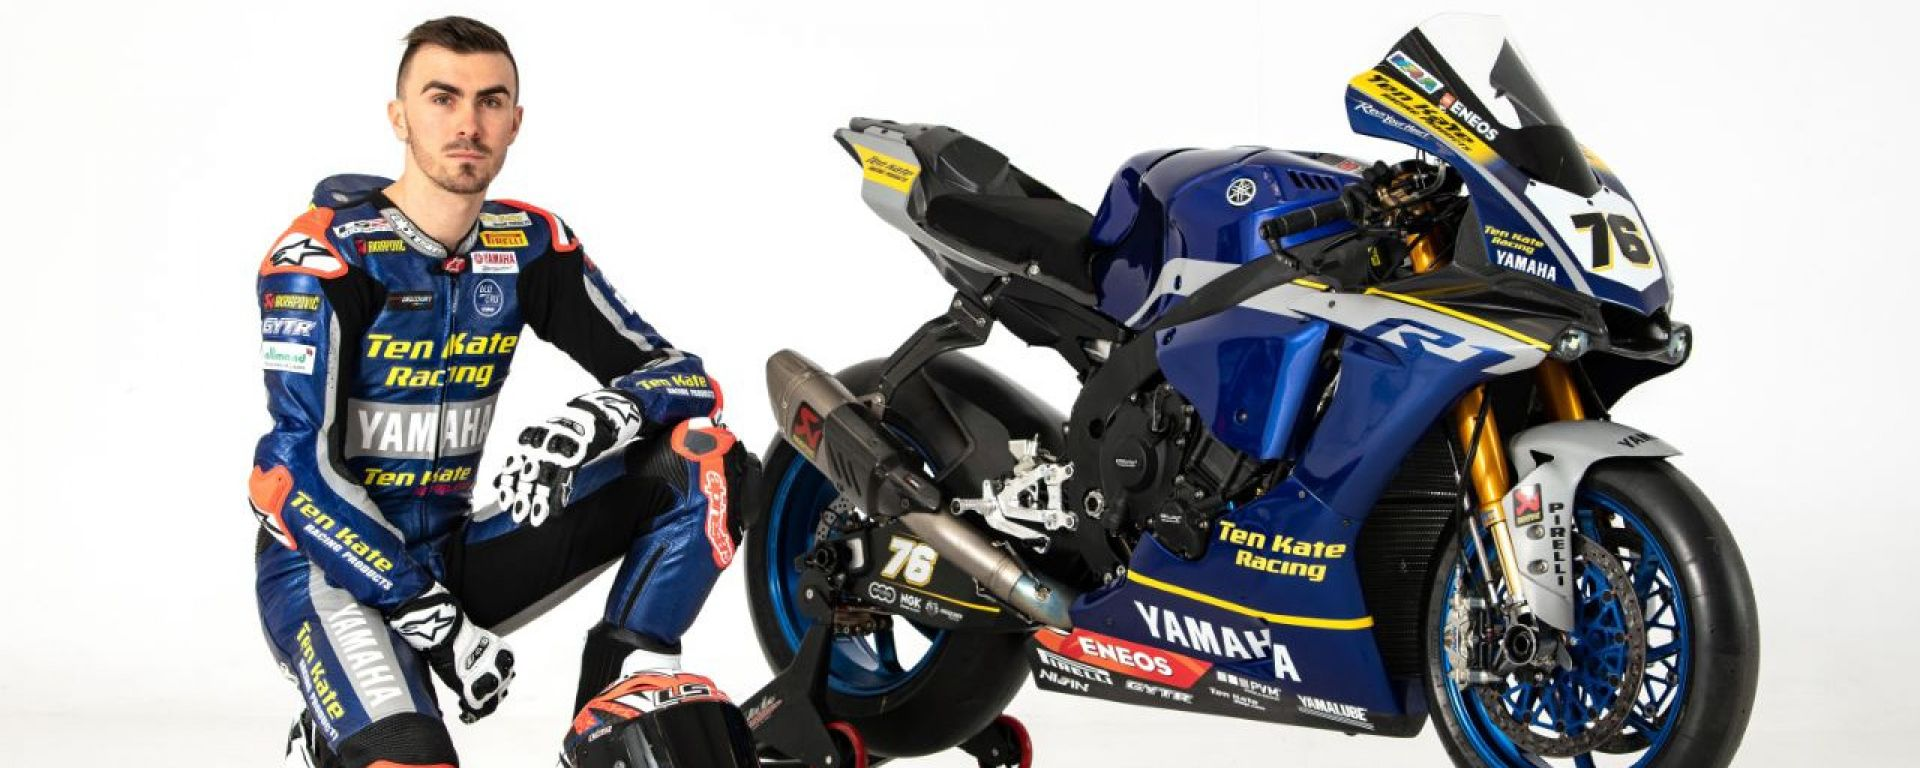 World Superbike 2020, Loris Baz (Yamaha)